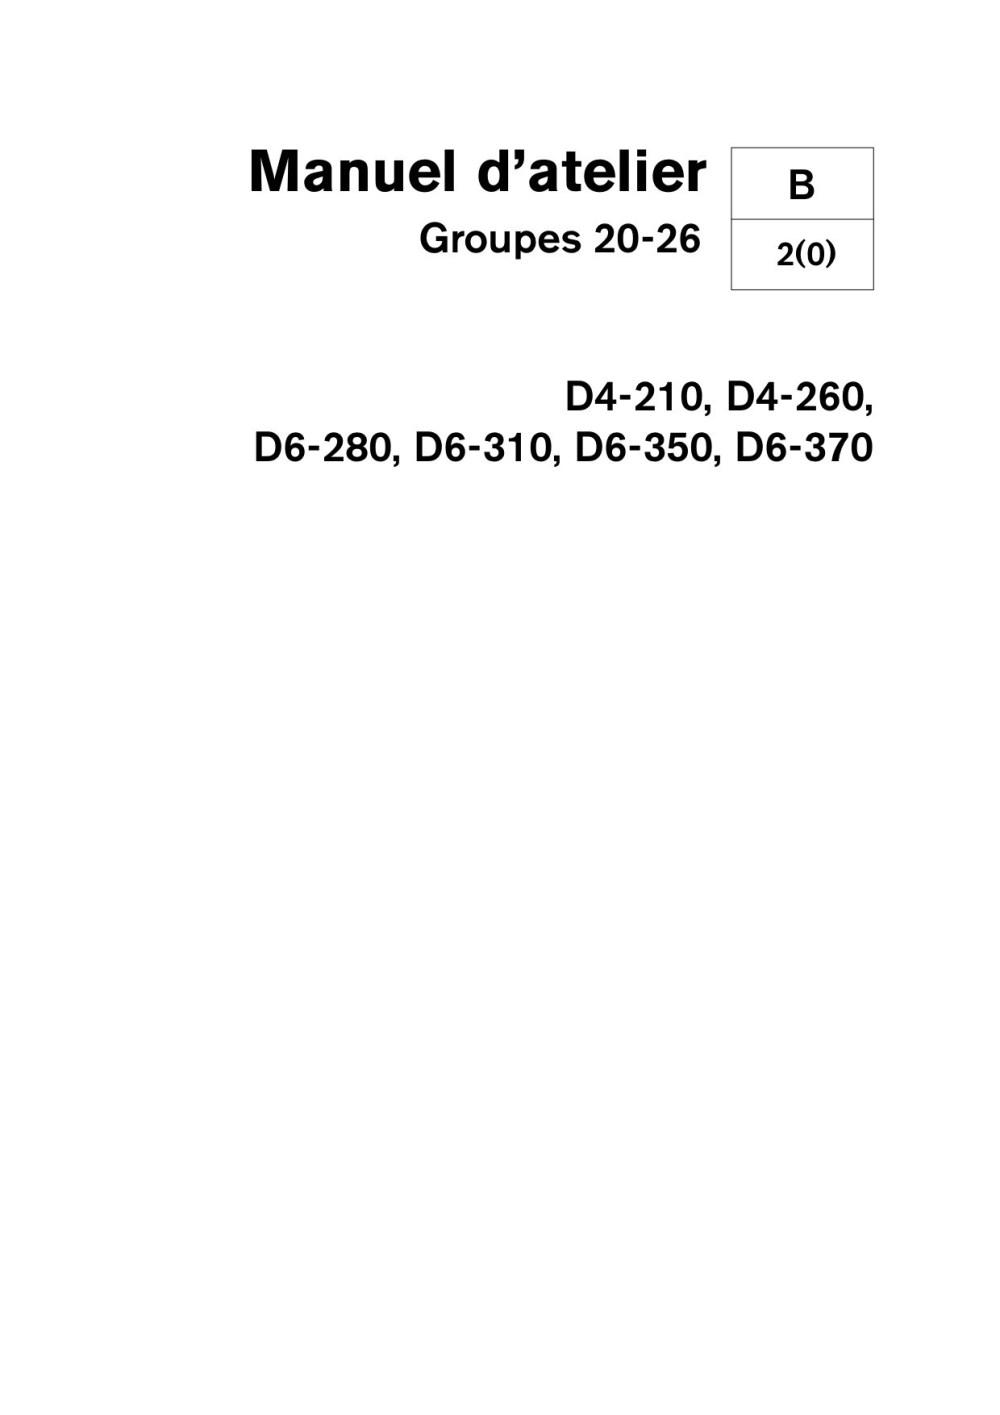 medium resolution of volvo penta diesel d4 210 d4 260 d6 280 d6 310 d6 350 d6 370 groupe 20 26 02 2006